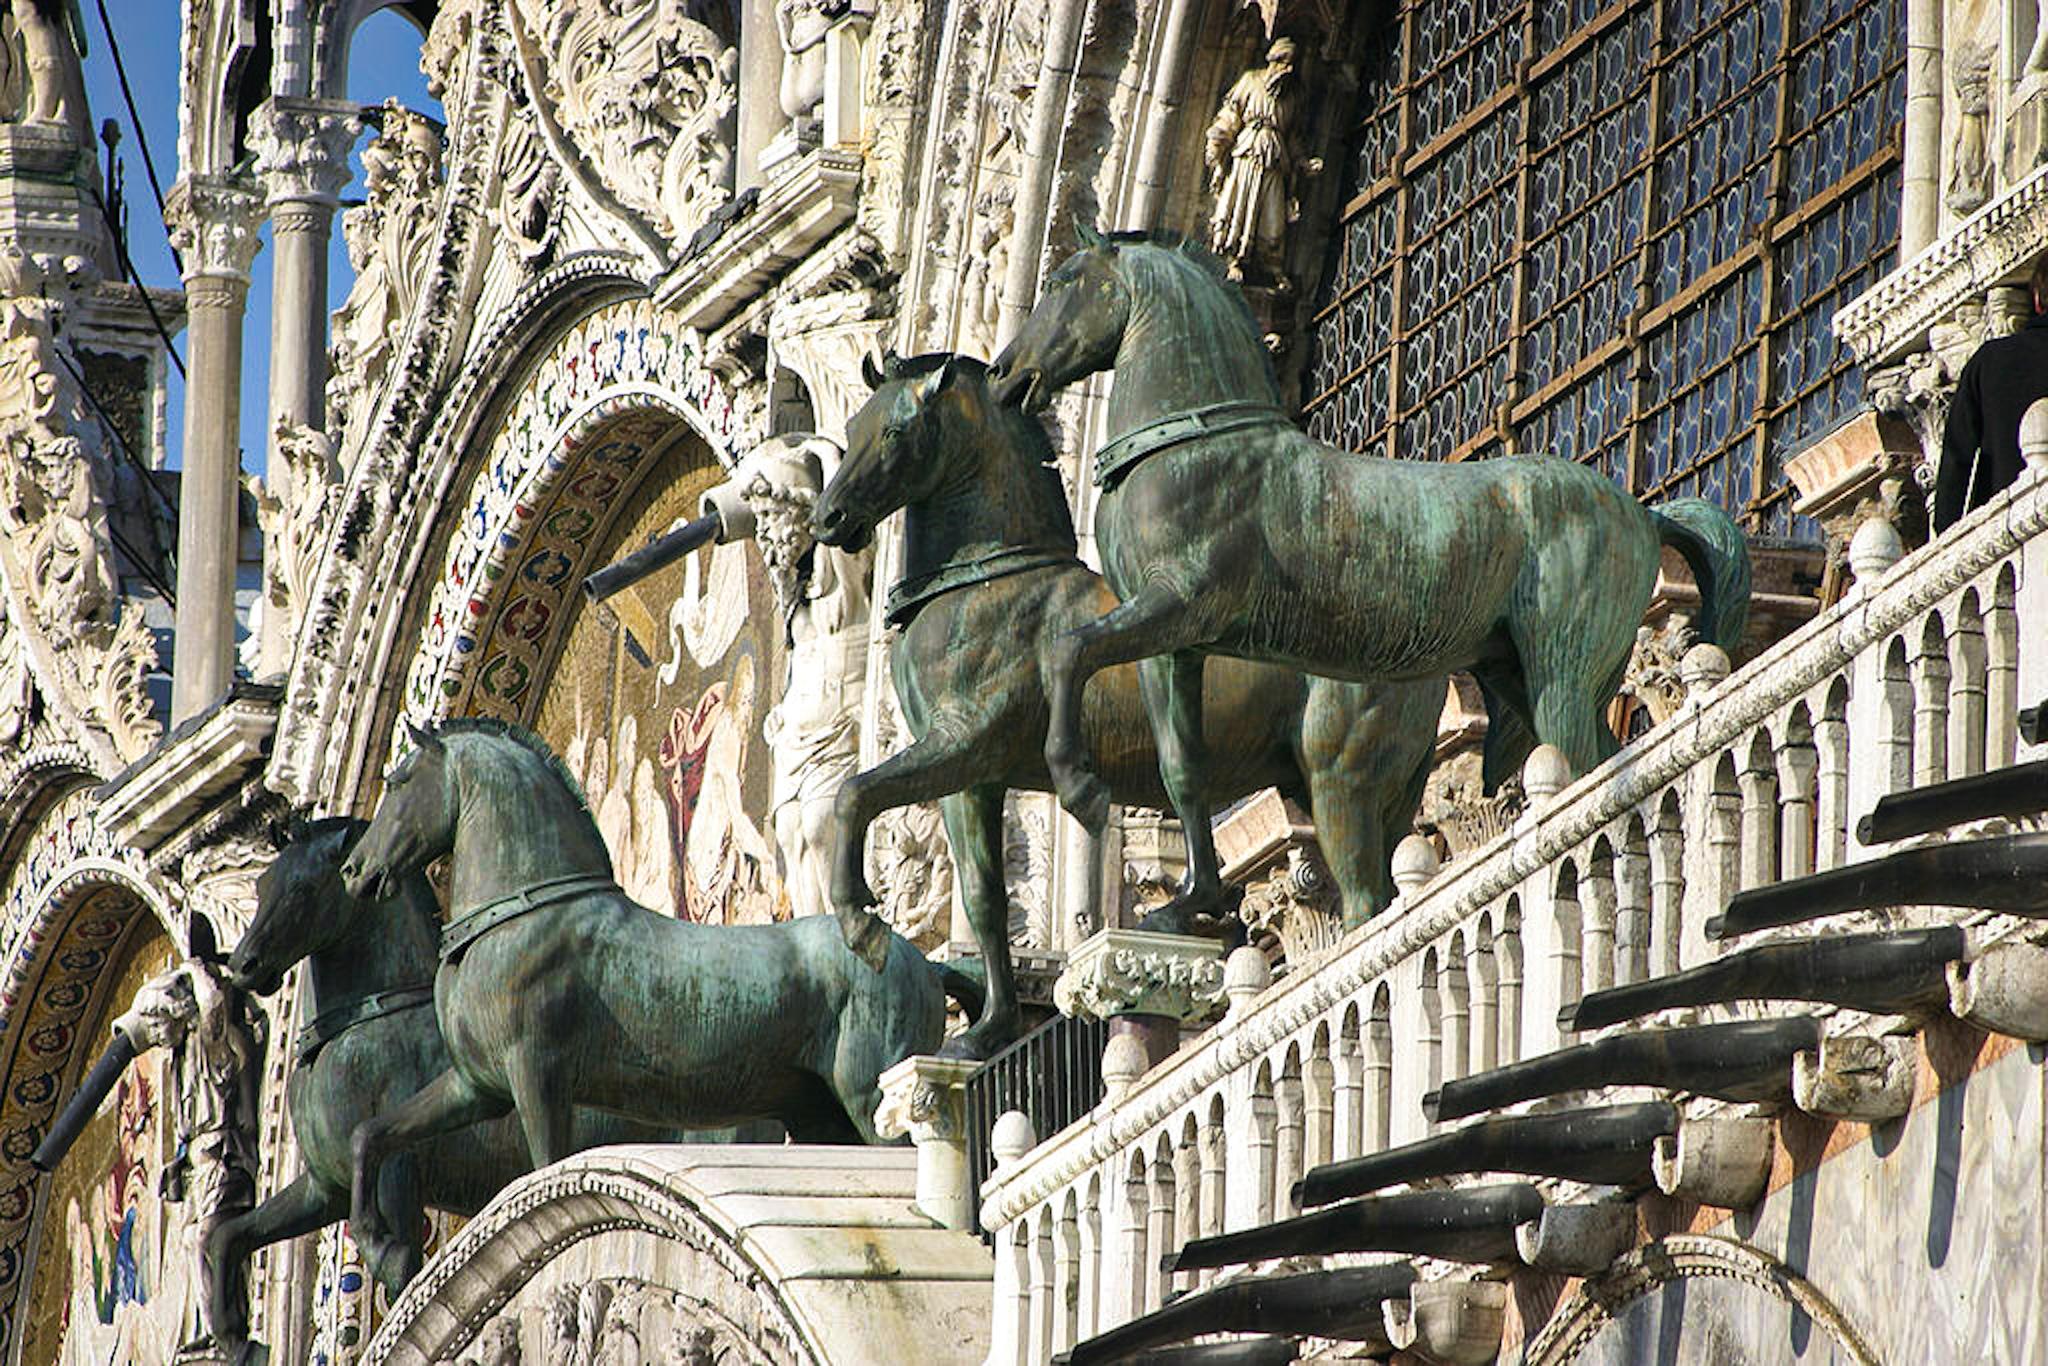 Facade of St. Mark's Basilica - St. Mark's Horses